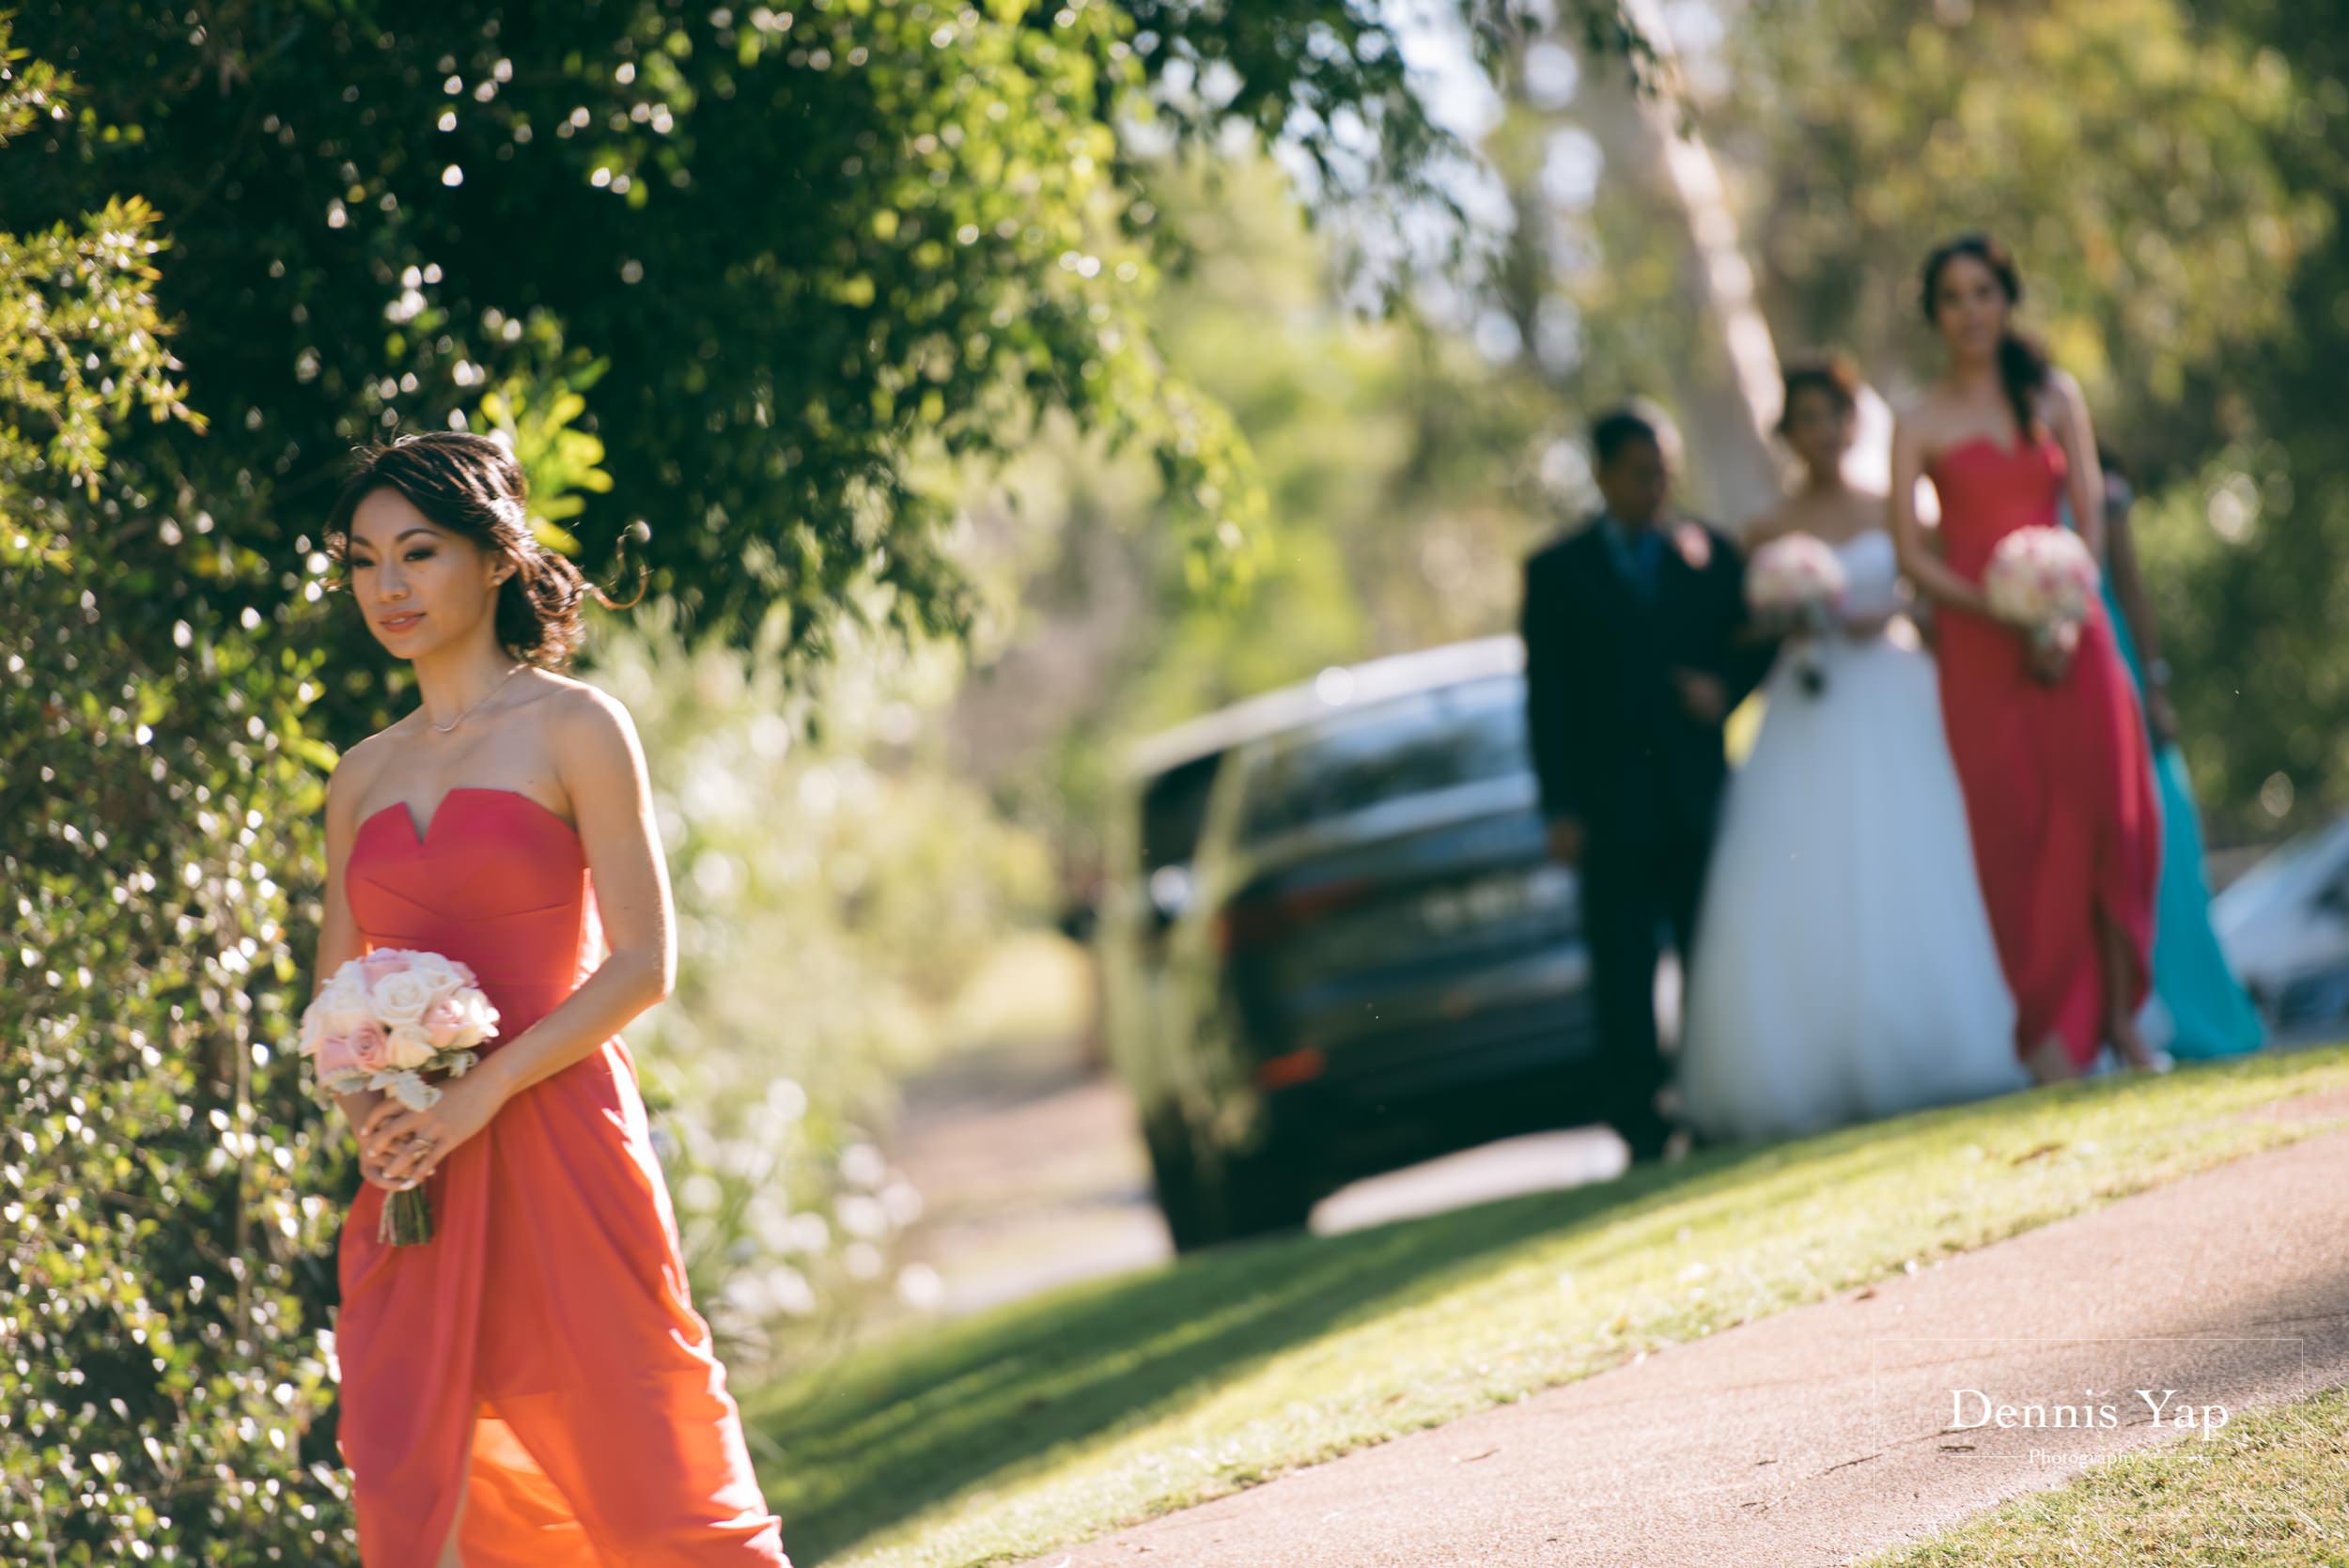 thang veng vietnamese wedding brisbane dennis yap photography malaysia wedding photographer-22.jpg